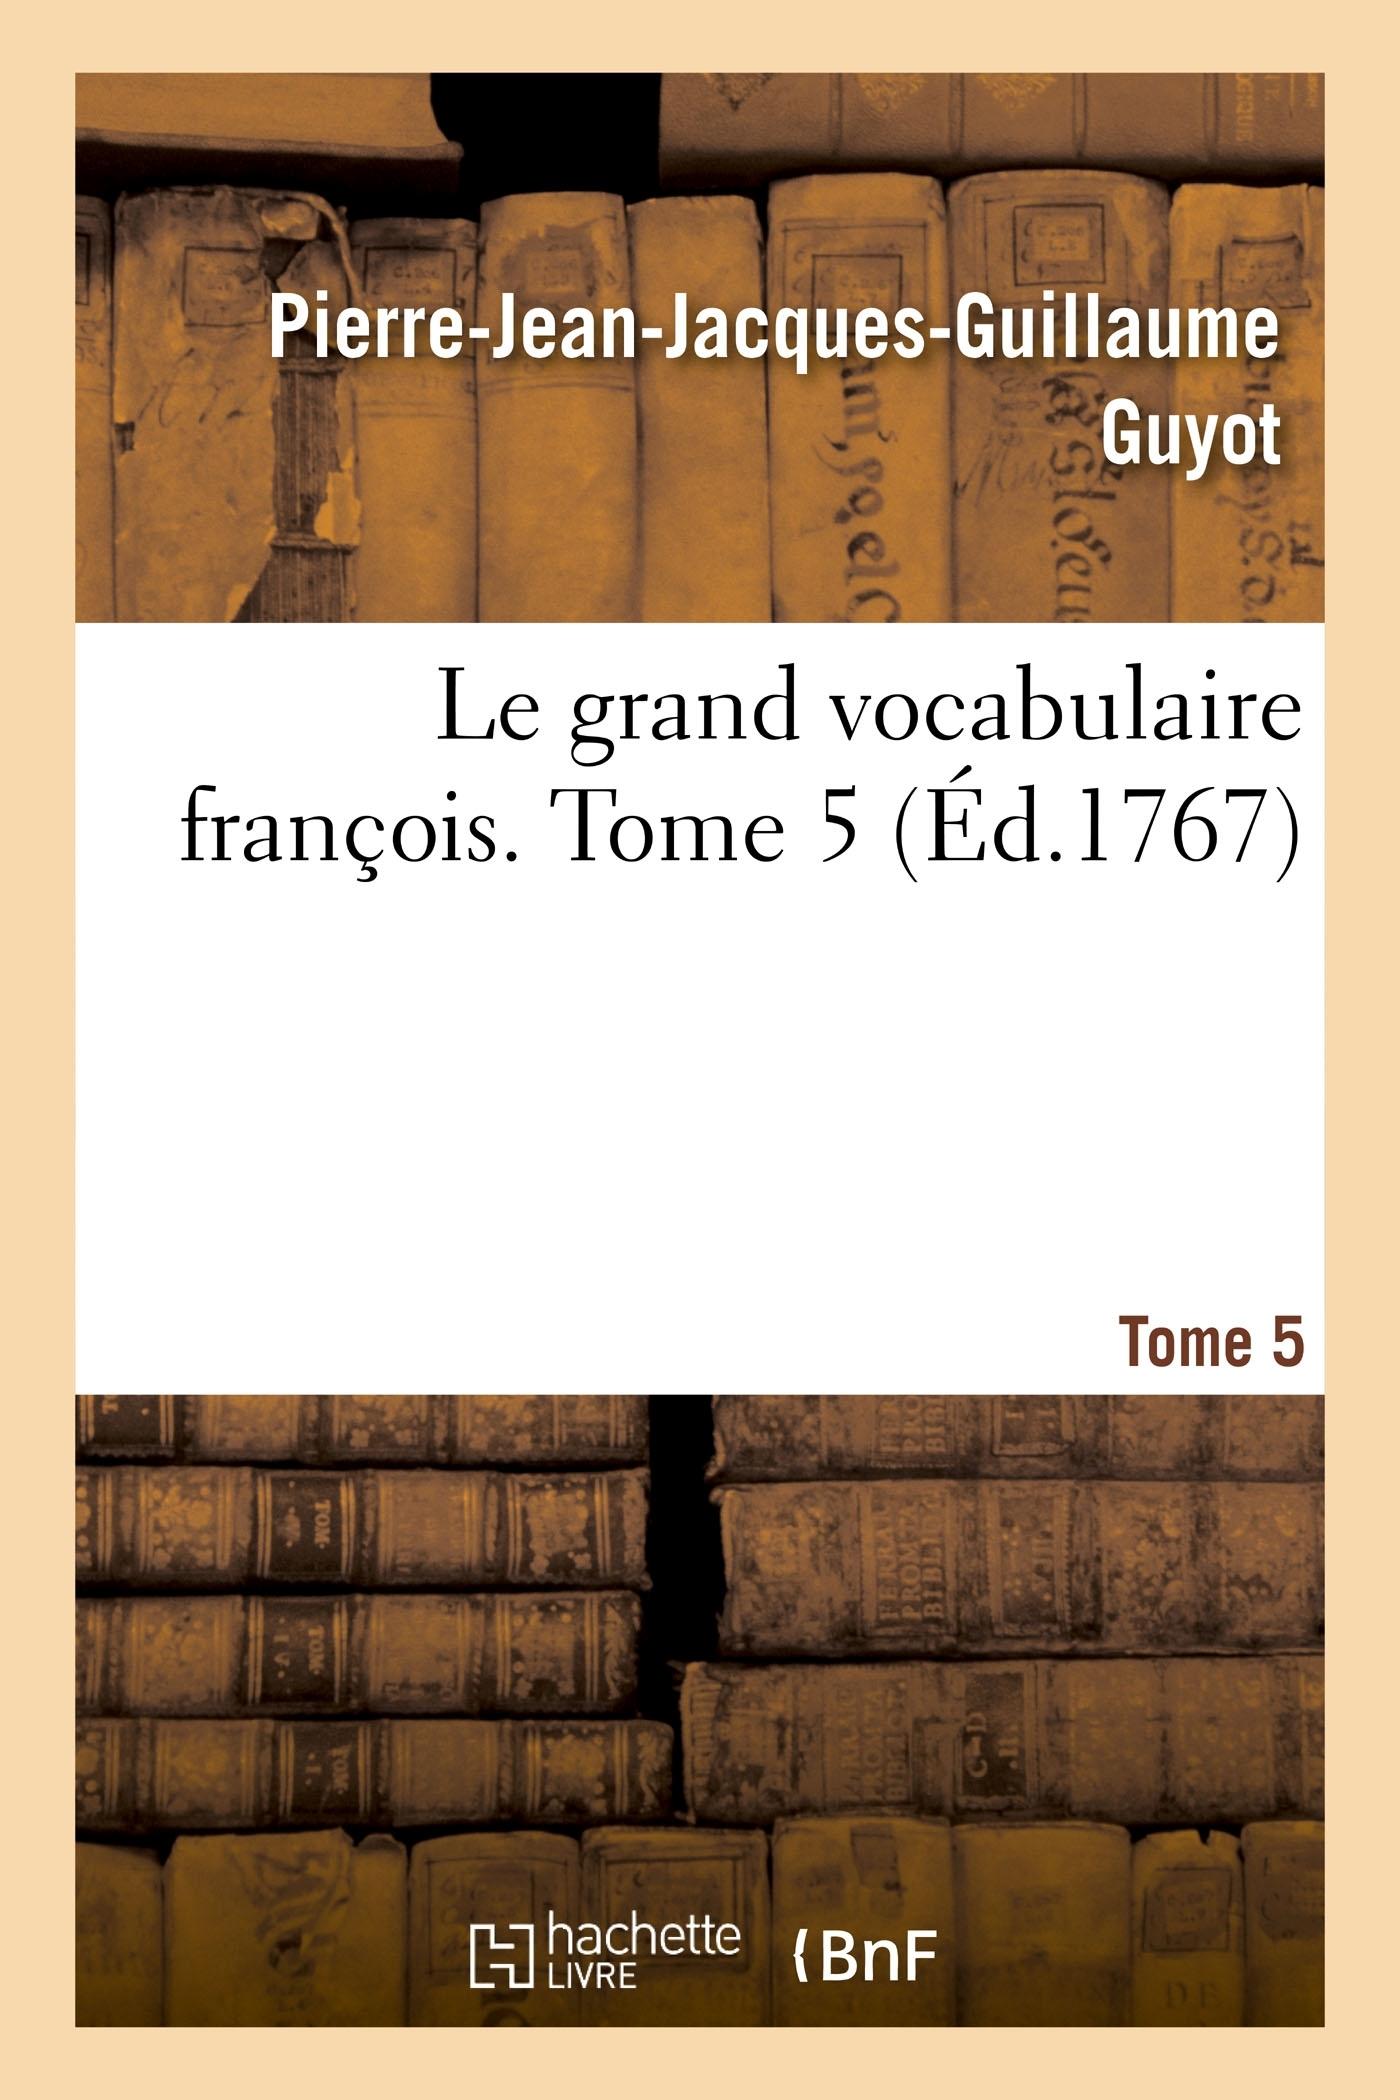 LE GRAND VOCABULAIRE FRANCOIS. TOME 5